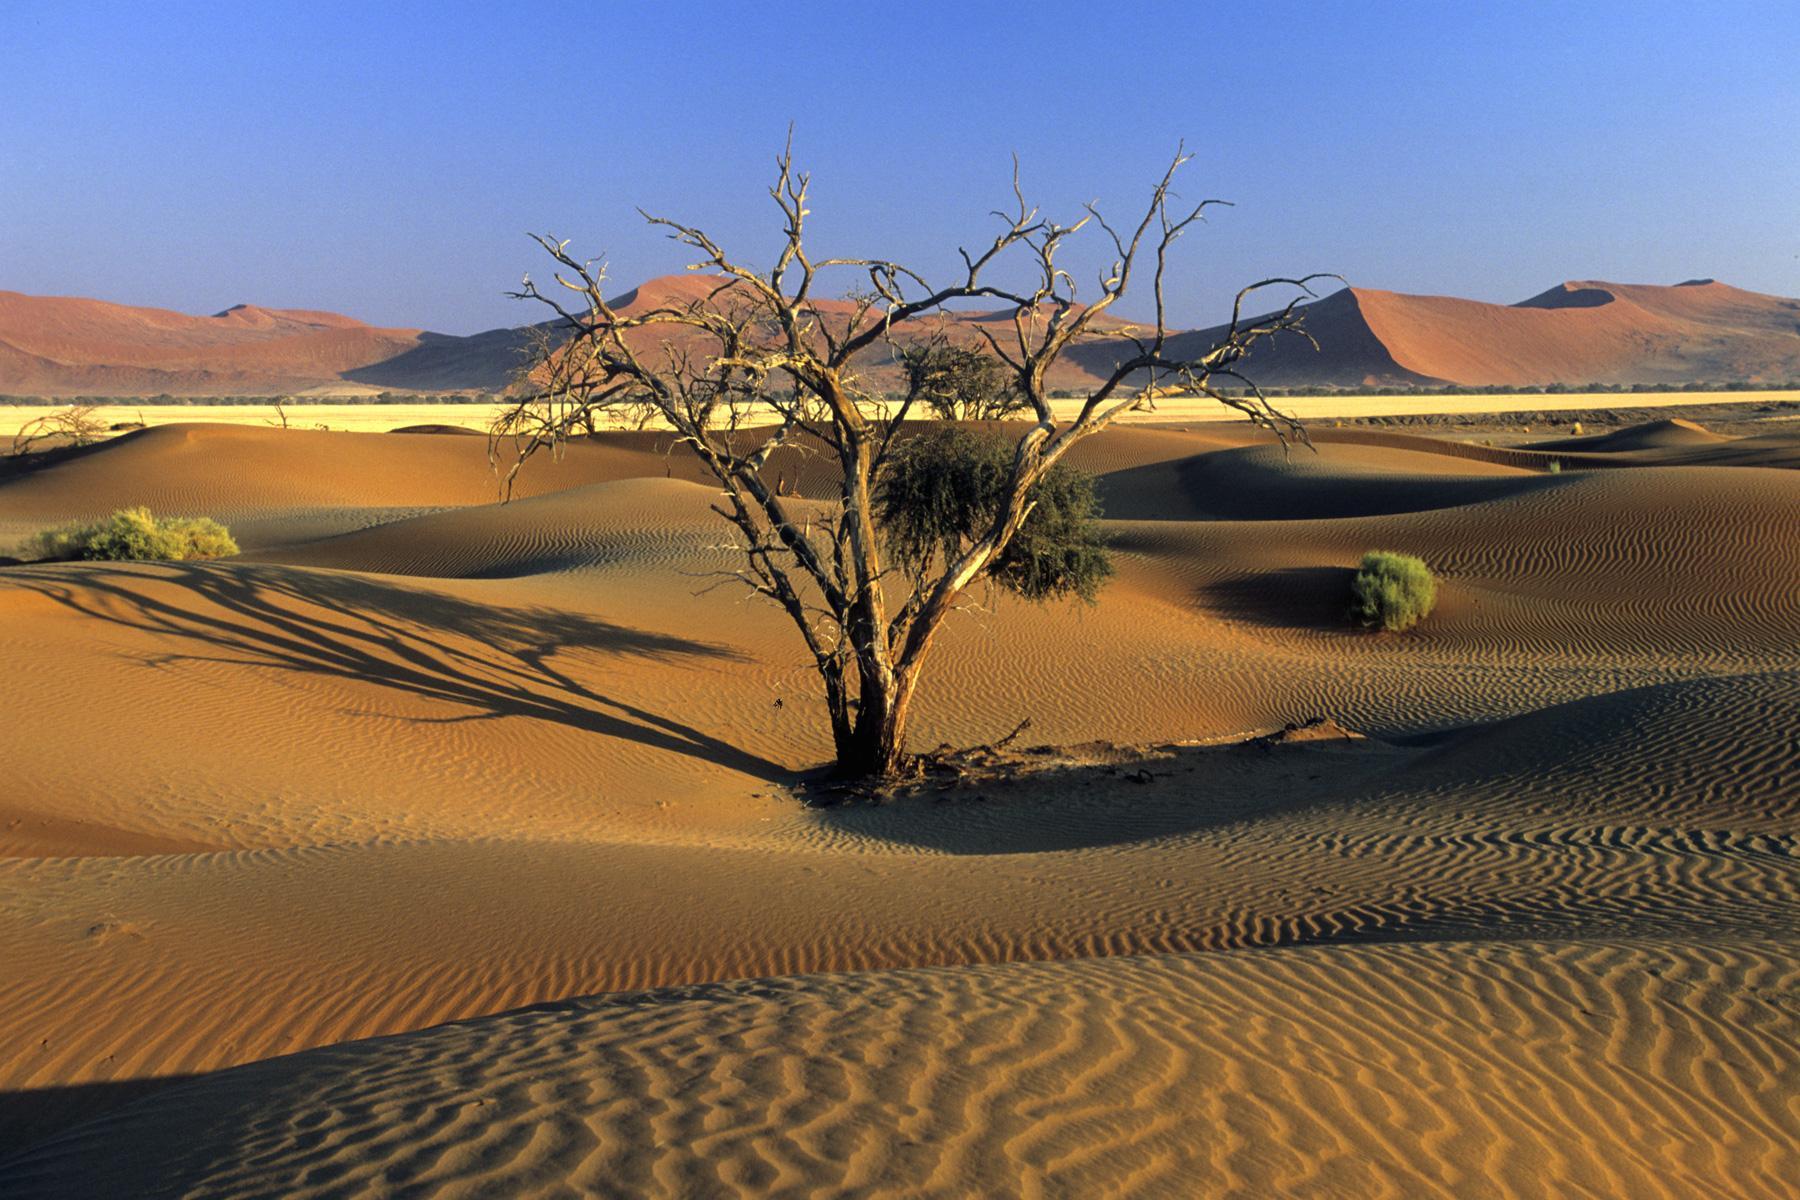 désert paysage